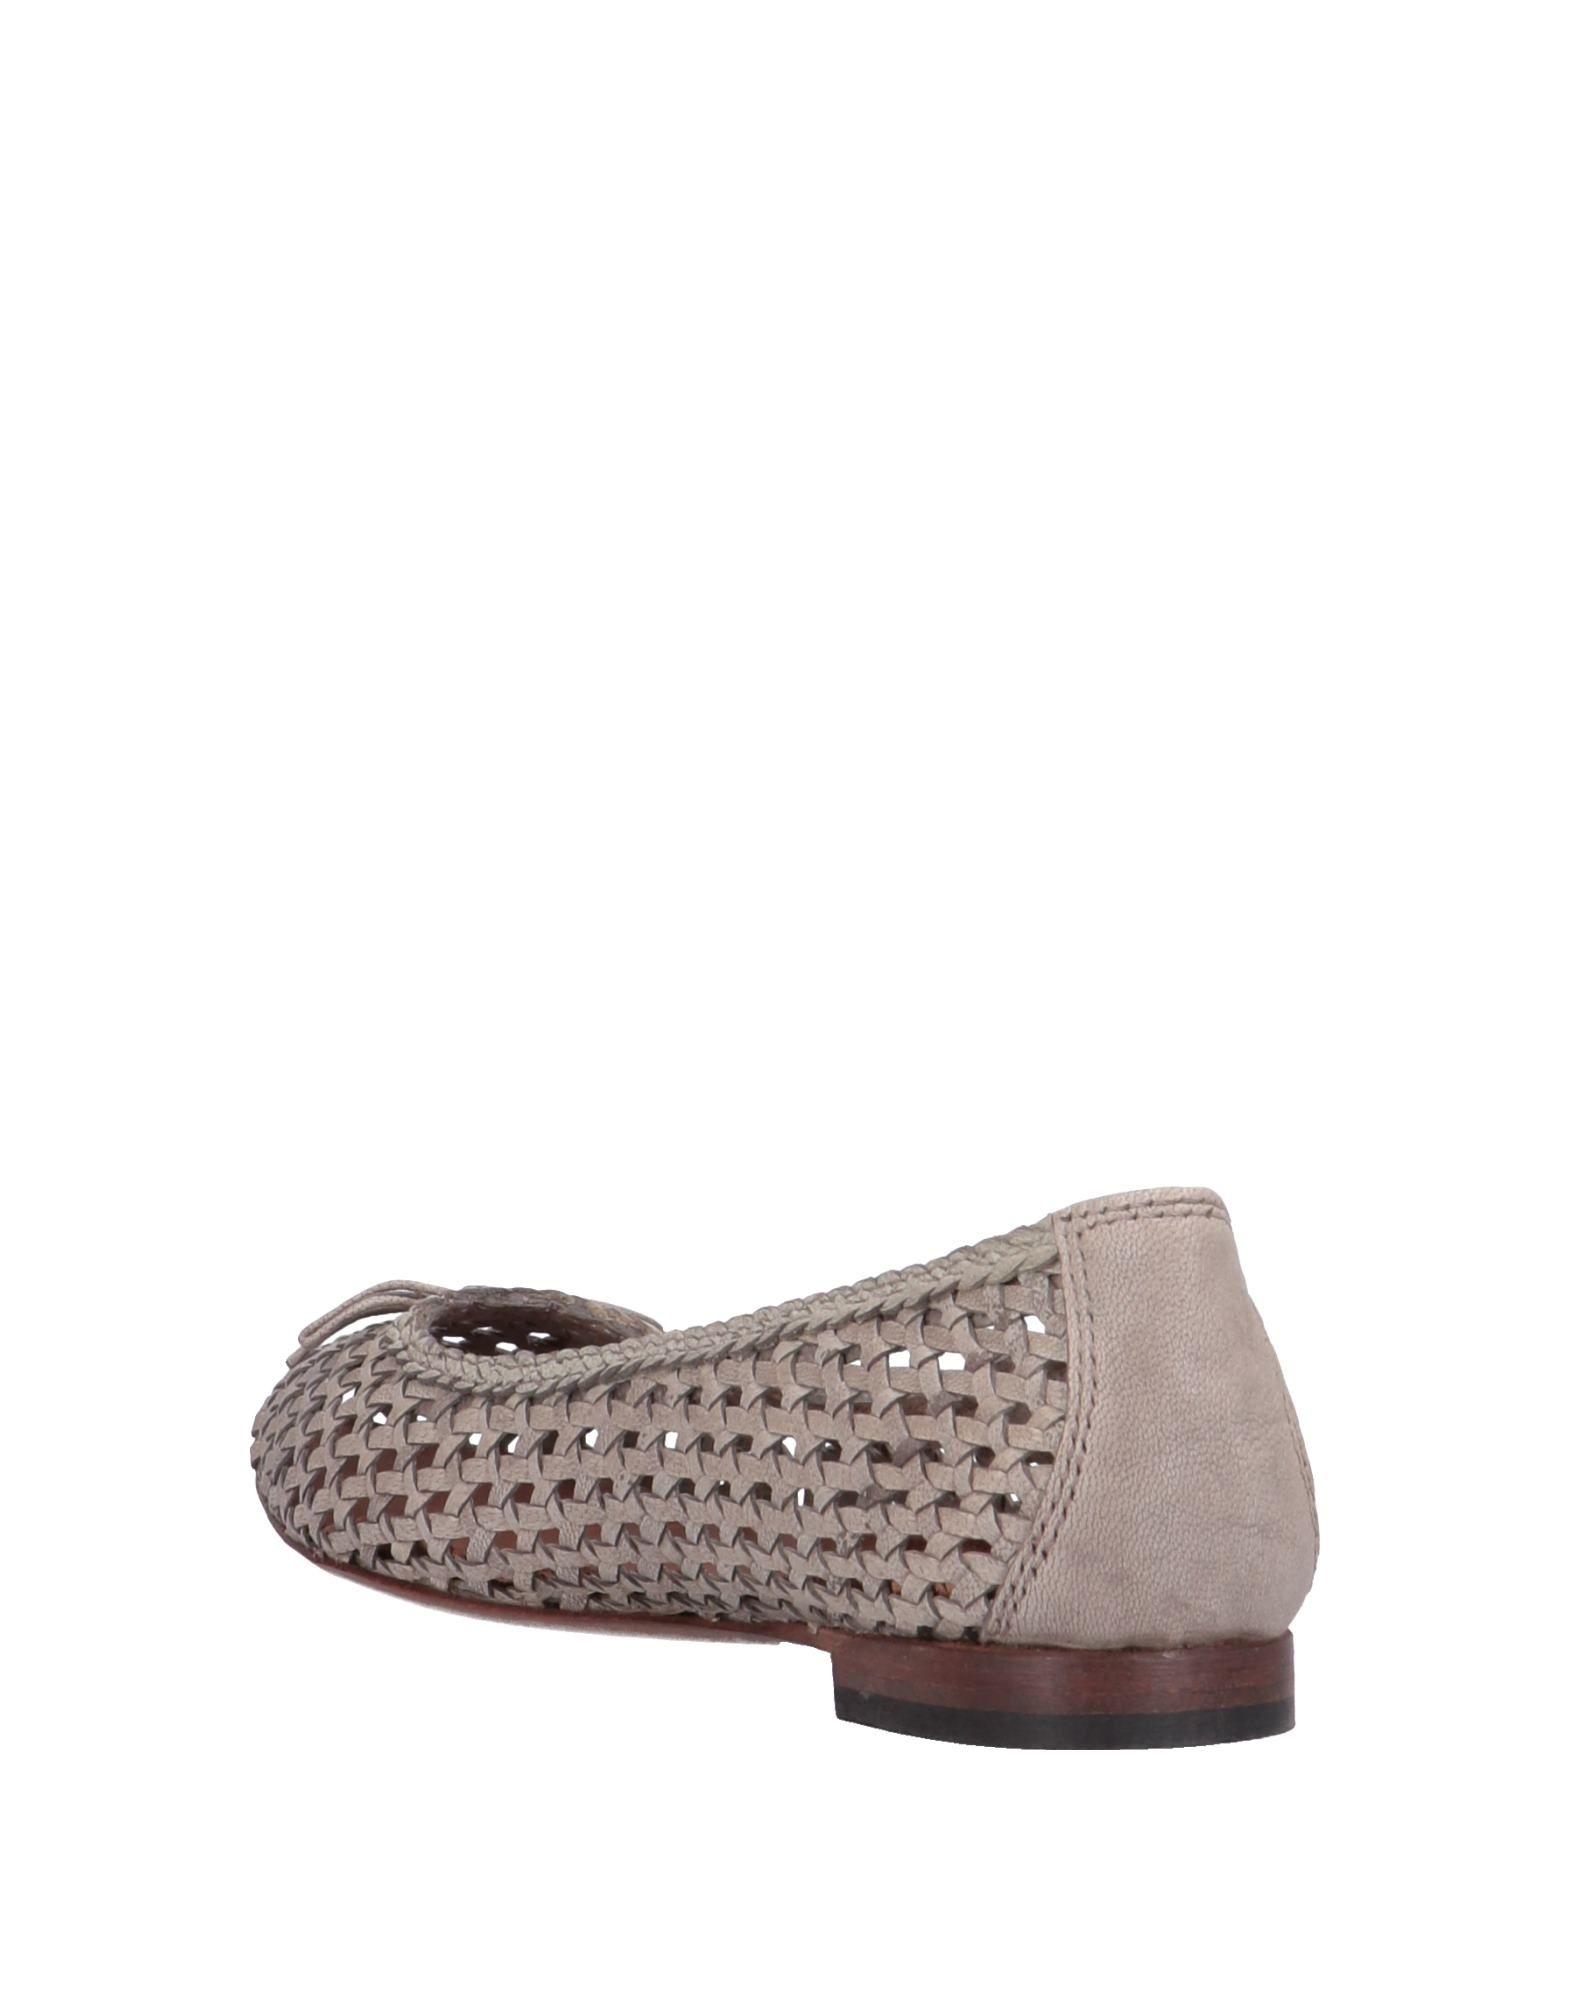 Cafènoir 11558895AE Ballerinas Damen  11558895AE Cafènoir Gute Qualität beliebte Schuhe 17276e